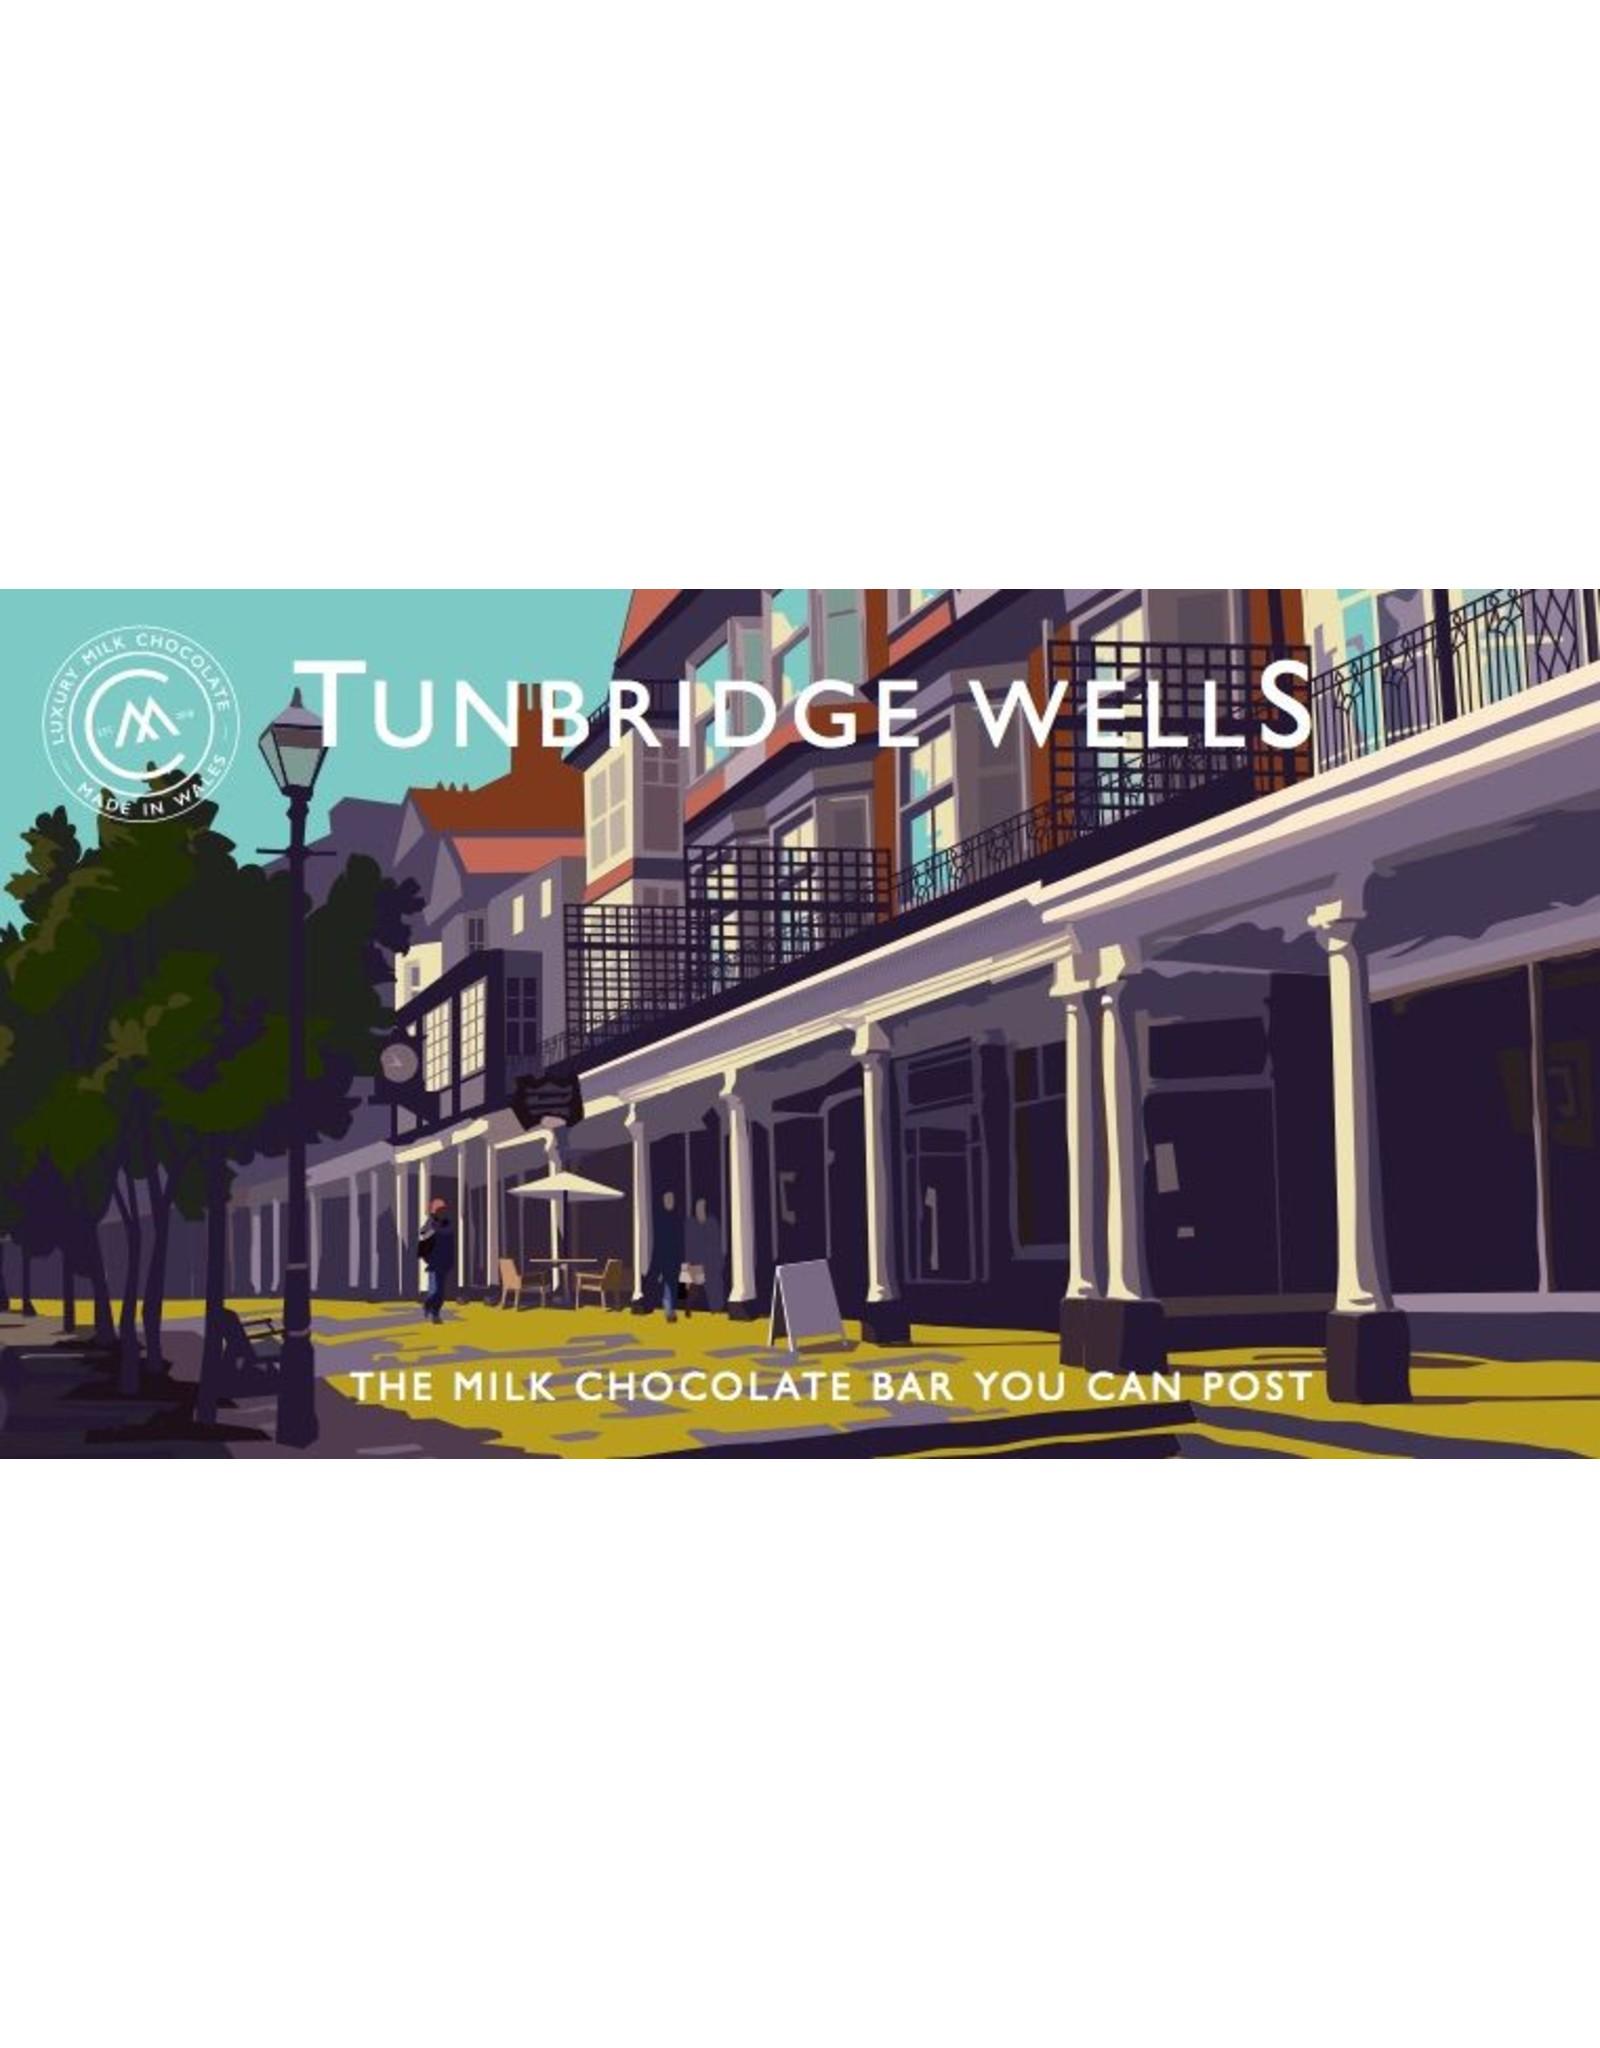 The Chocolate Bar You Can Post - Tunbridge Wells